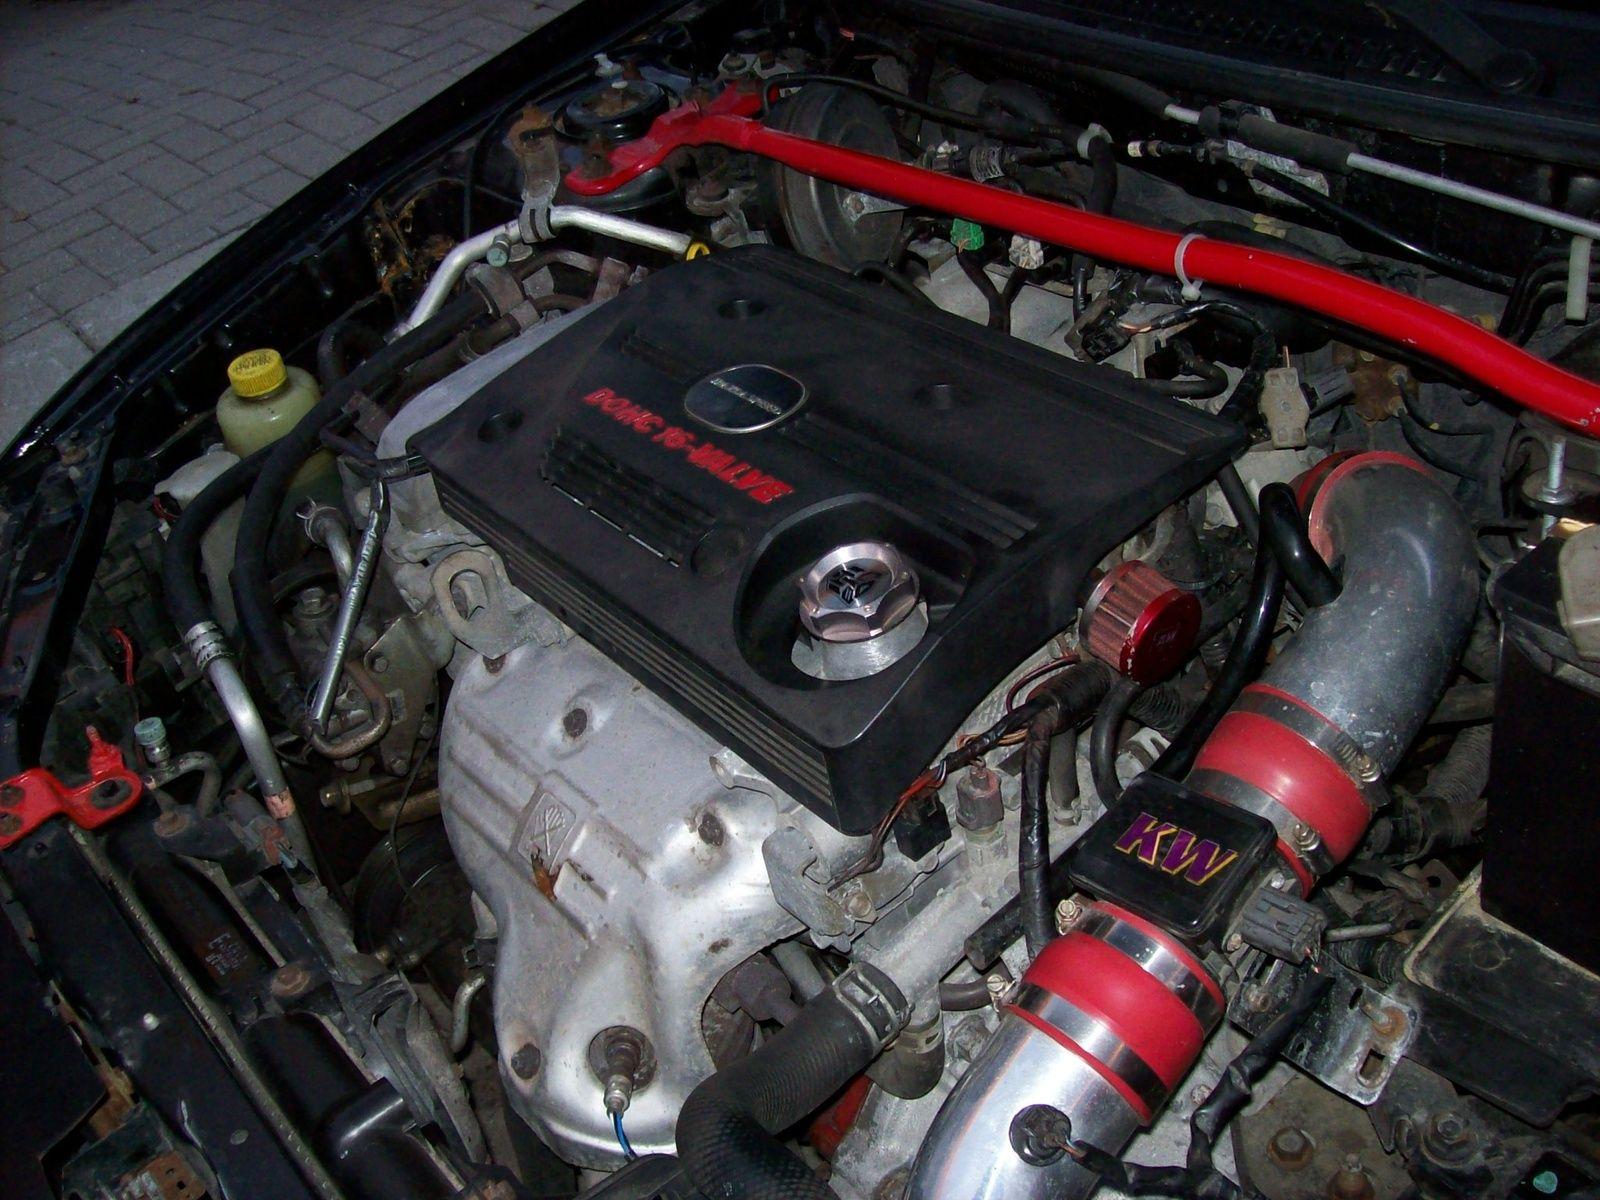 2002 Mazda PROTEGE5 #Used #Engine: Description: Gas Engine 150-160